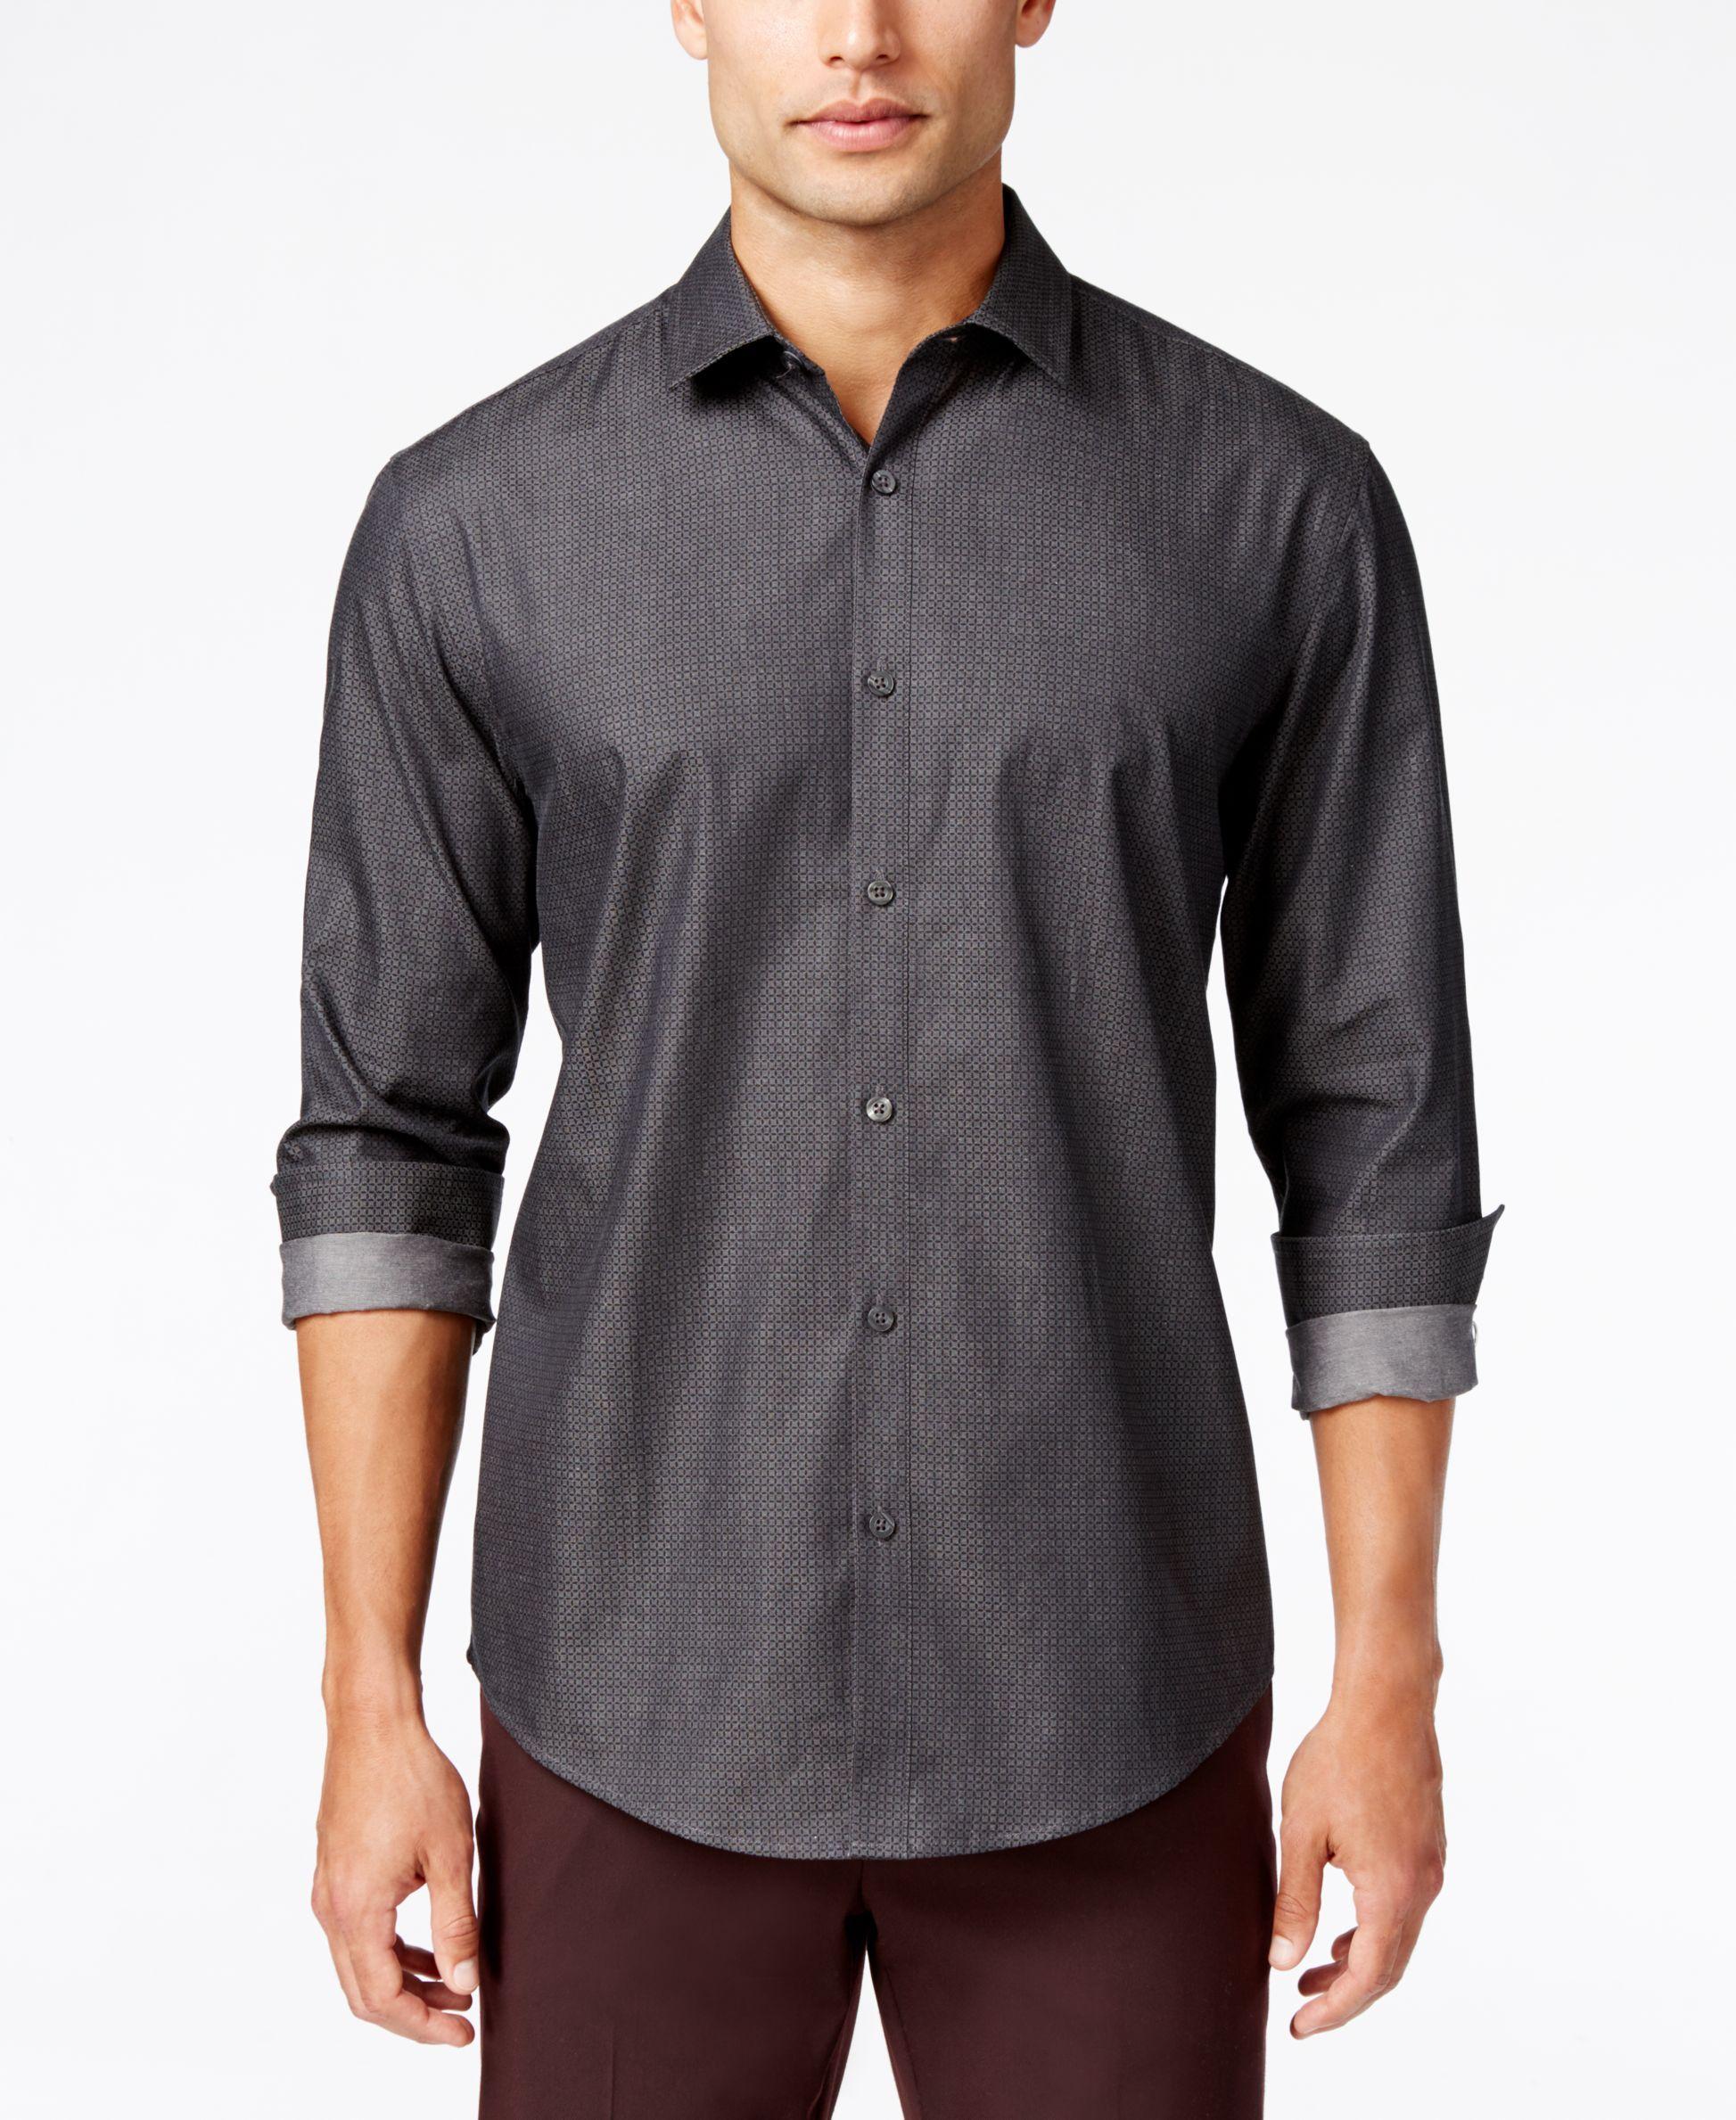 f6ca5626 Alfani Men's Big and Tall Grid Long-Sleeve Shirt, Classic Fit ...